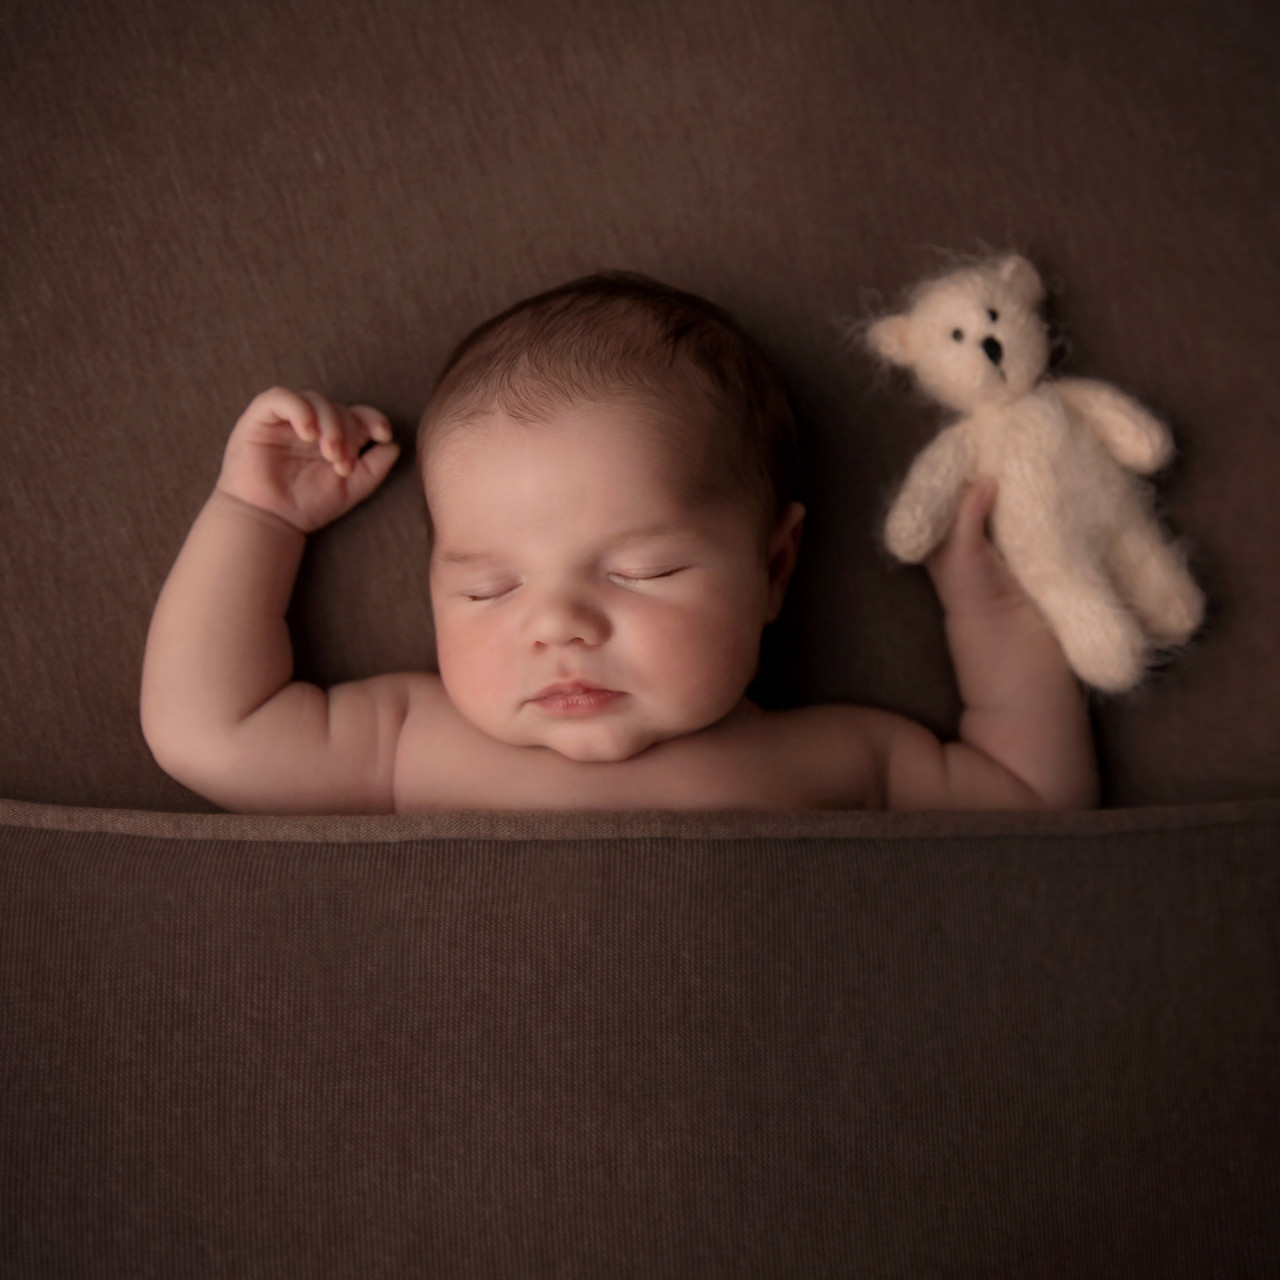 Baby holding bear asleep in tan